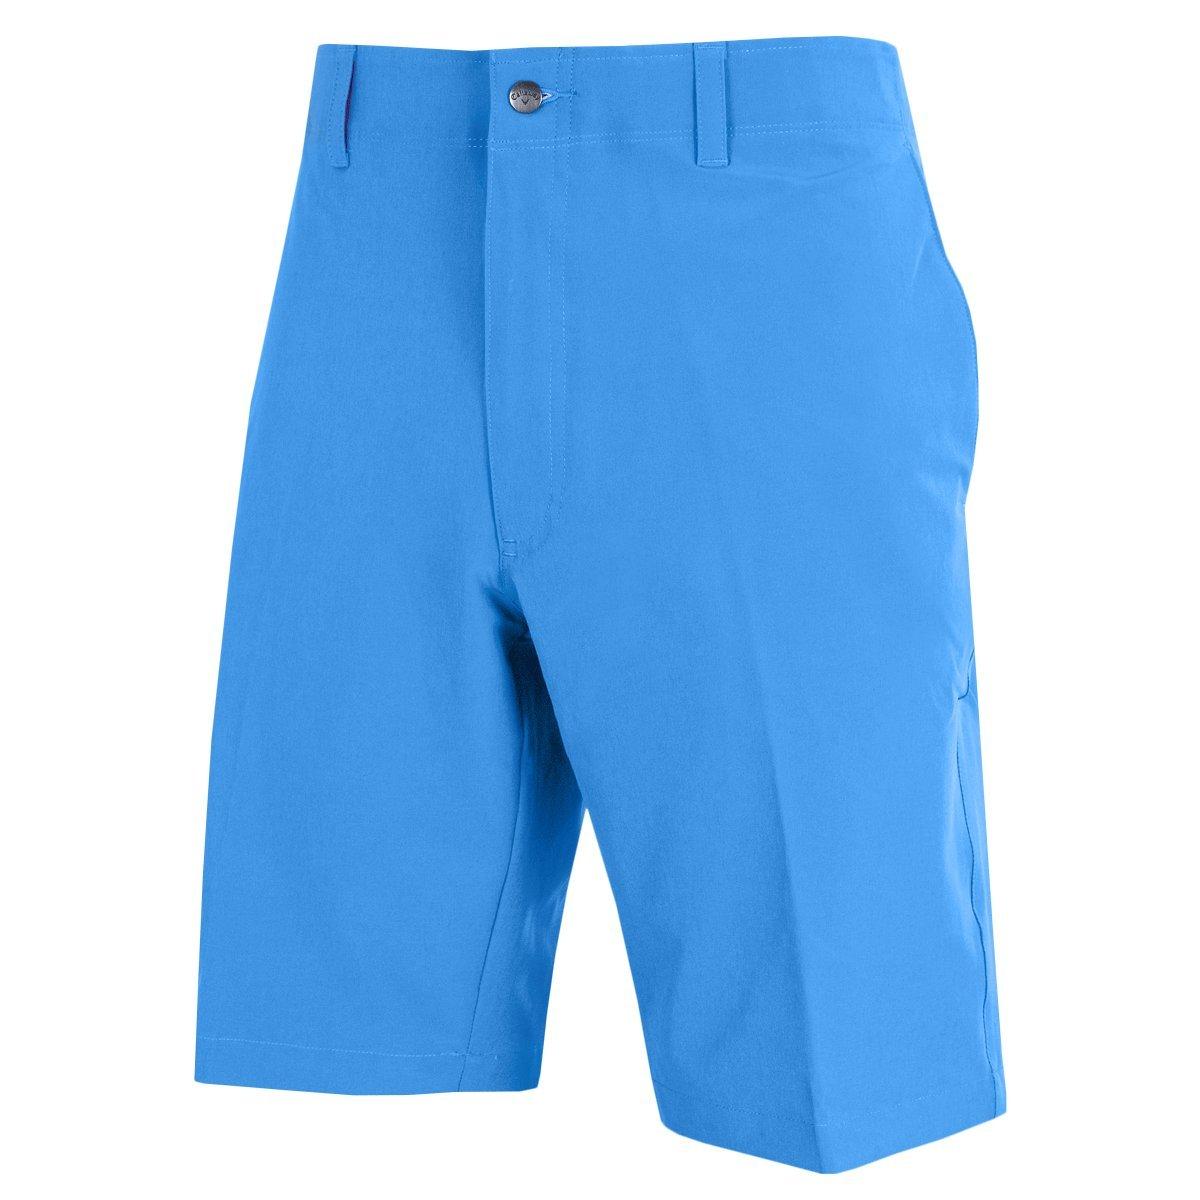 Callaway 2017メンズChev Tech Lightweight Tech Golf Shorts B078THHRDN 32